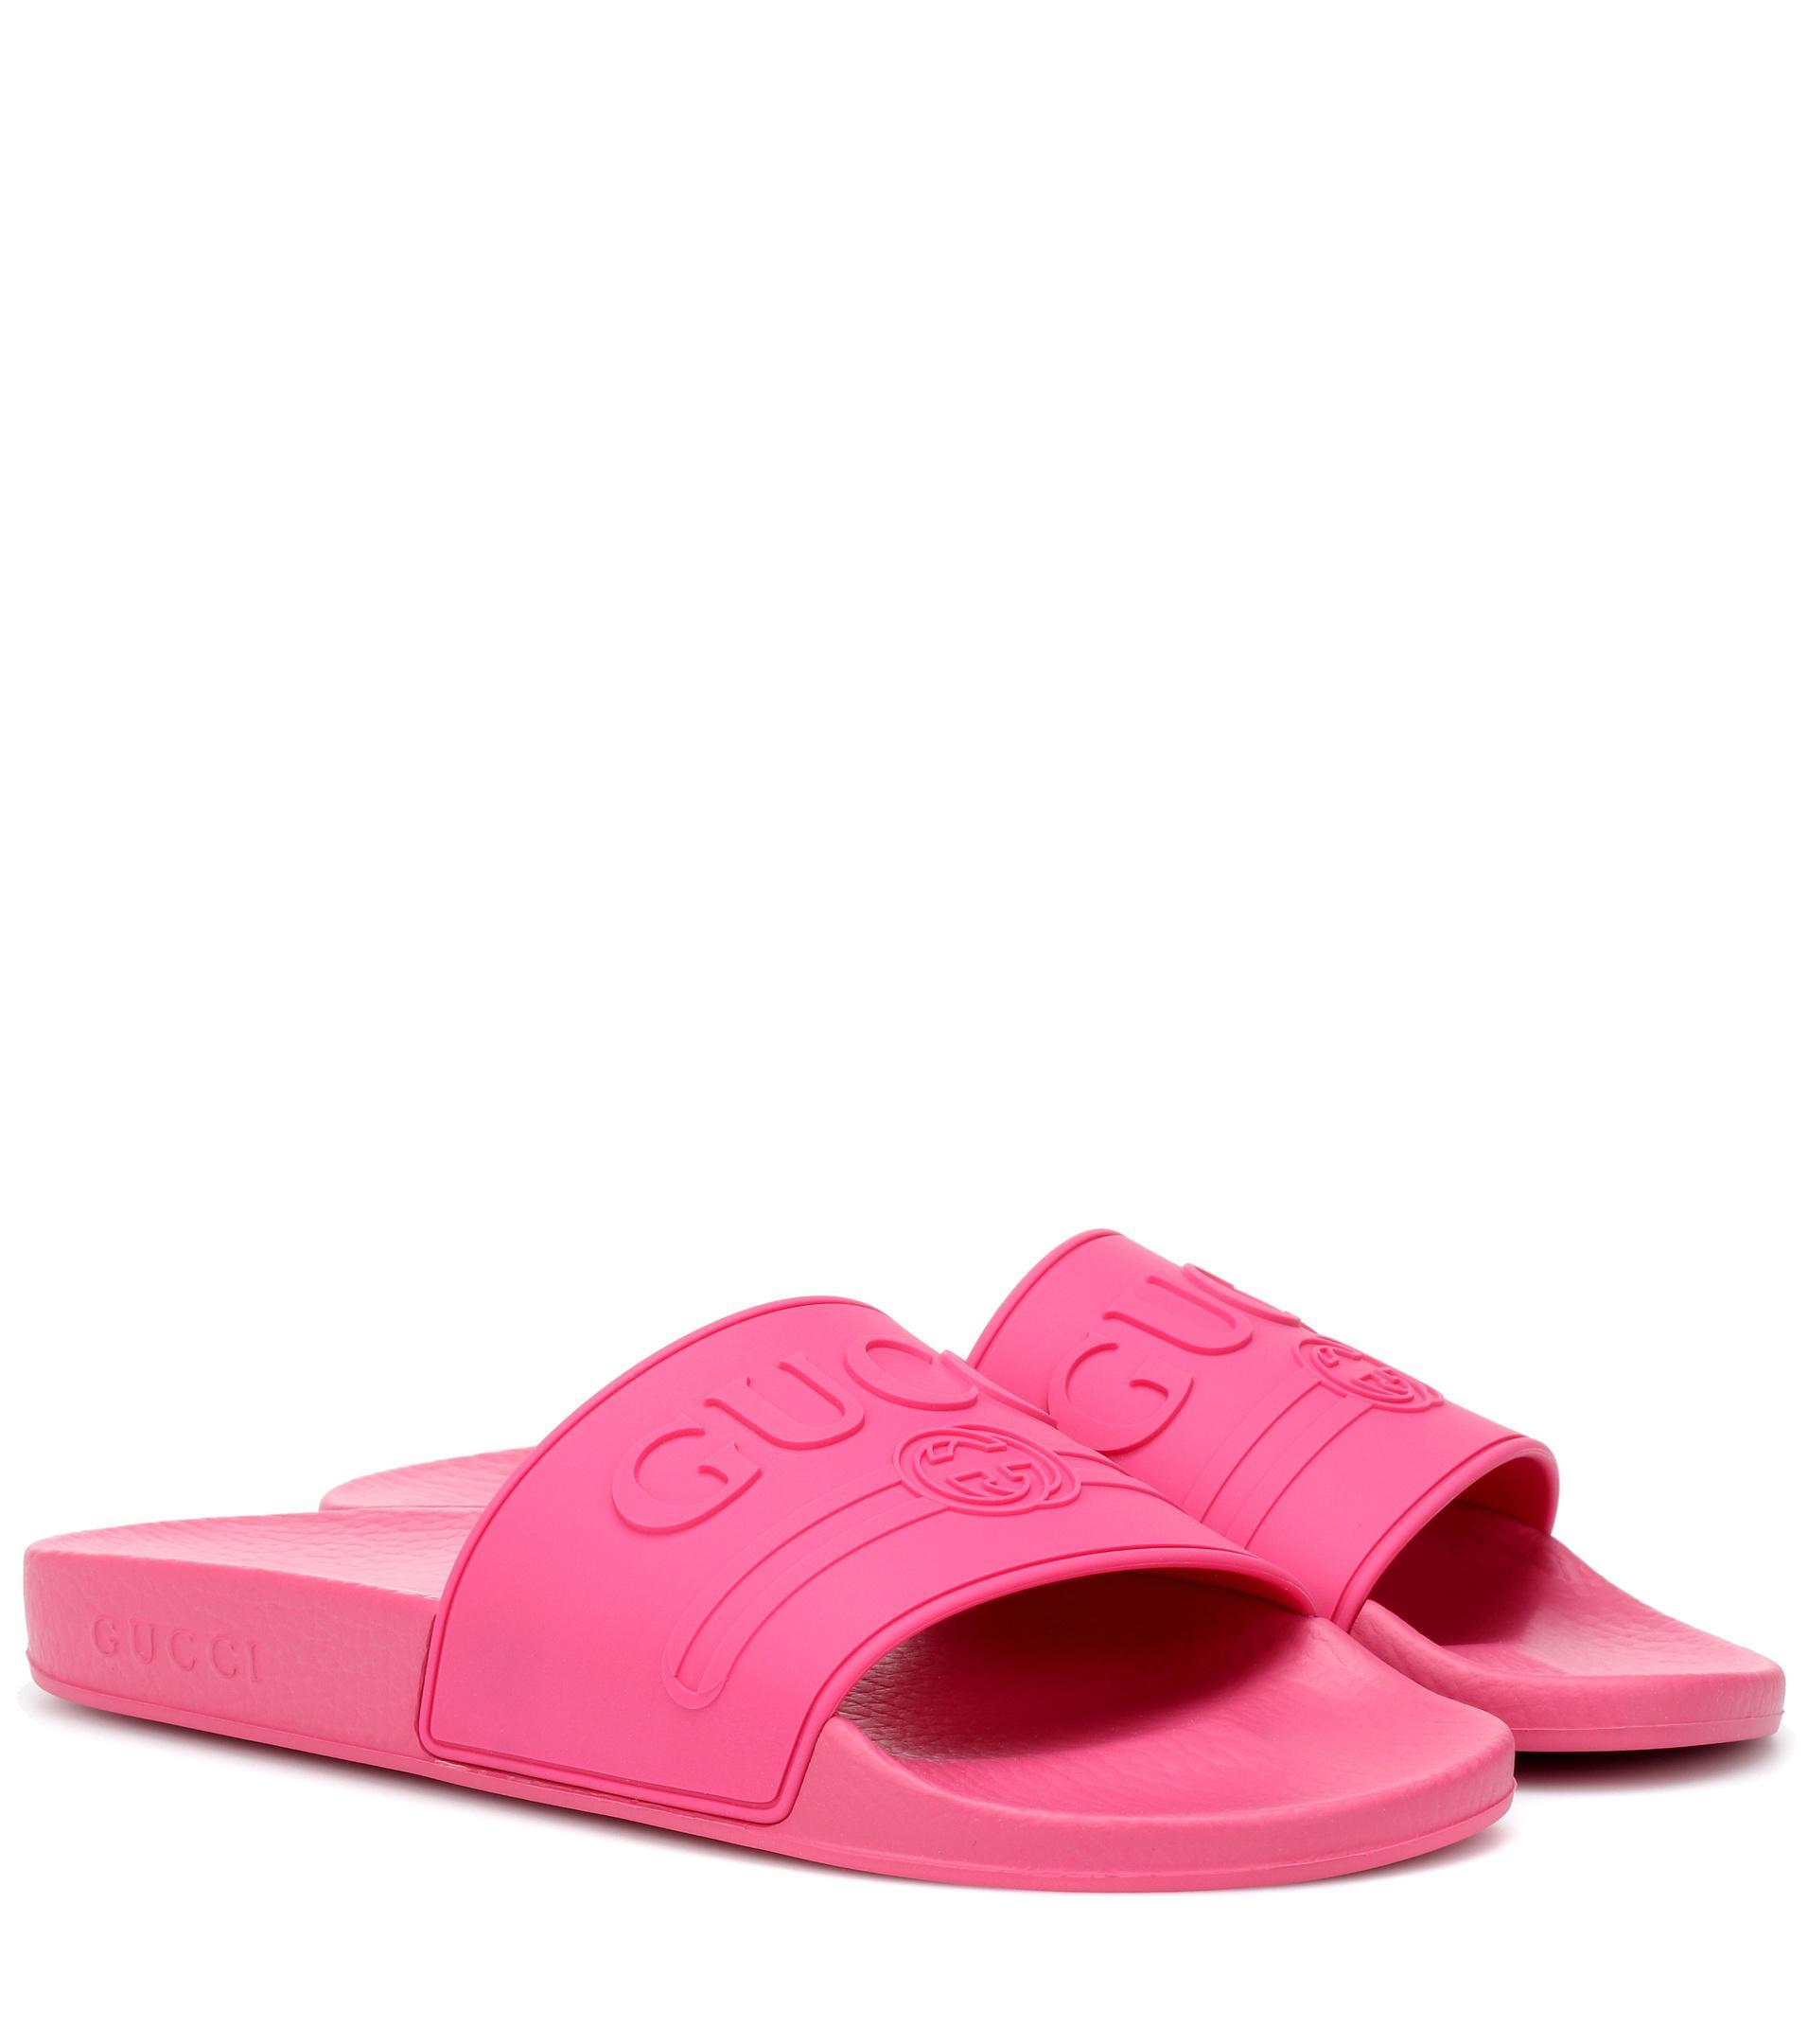 484ece6f9331c0 Gucci - Pink Logo-embossed Slides - Lyst. View fullscreen